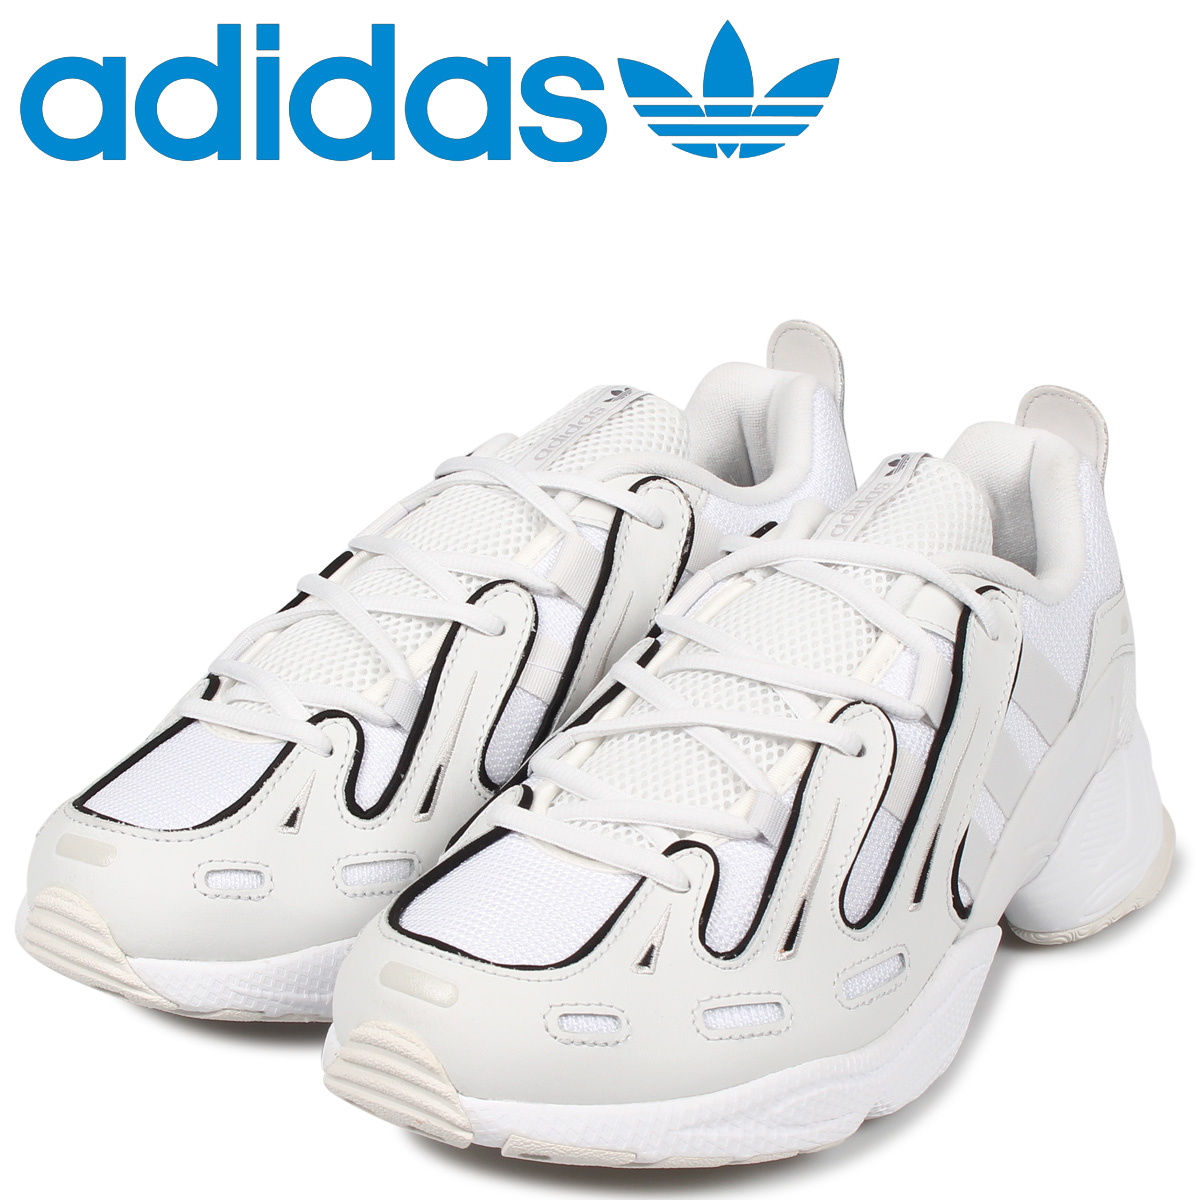 adidas Originals アディダス オリジナルス ガゼル スニーカー メンズ ガッツレー EQT GAZELLE ホワイト 白 EE7744